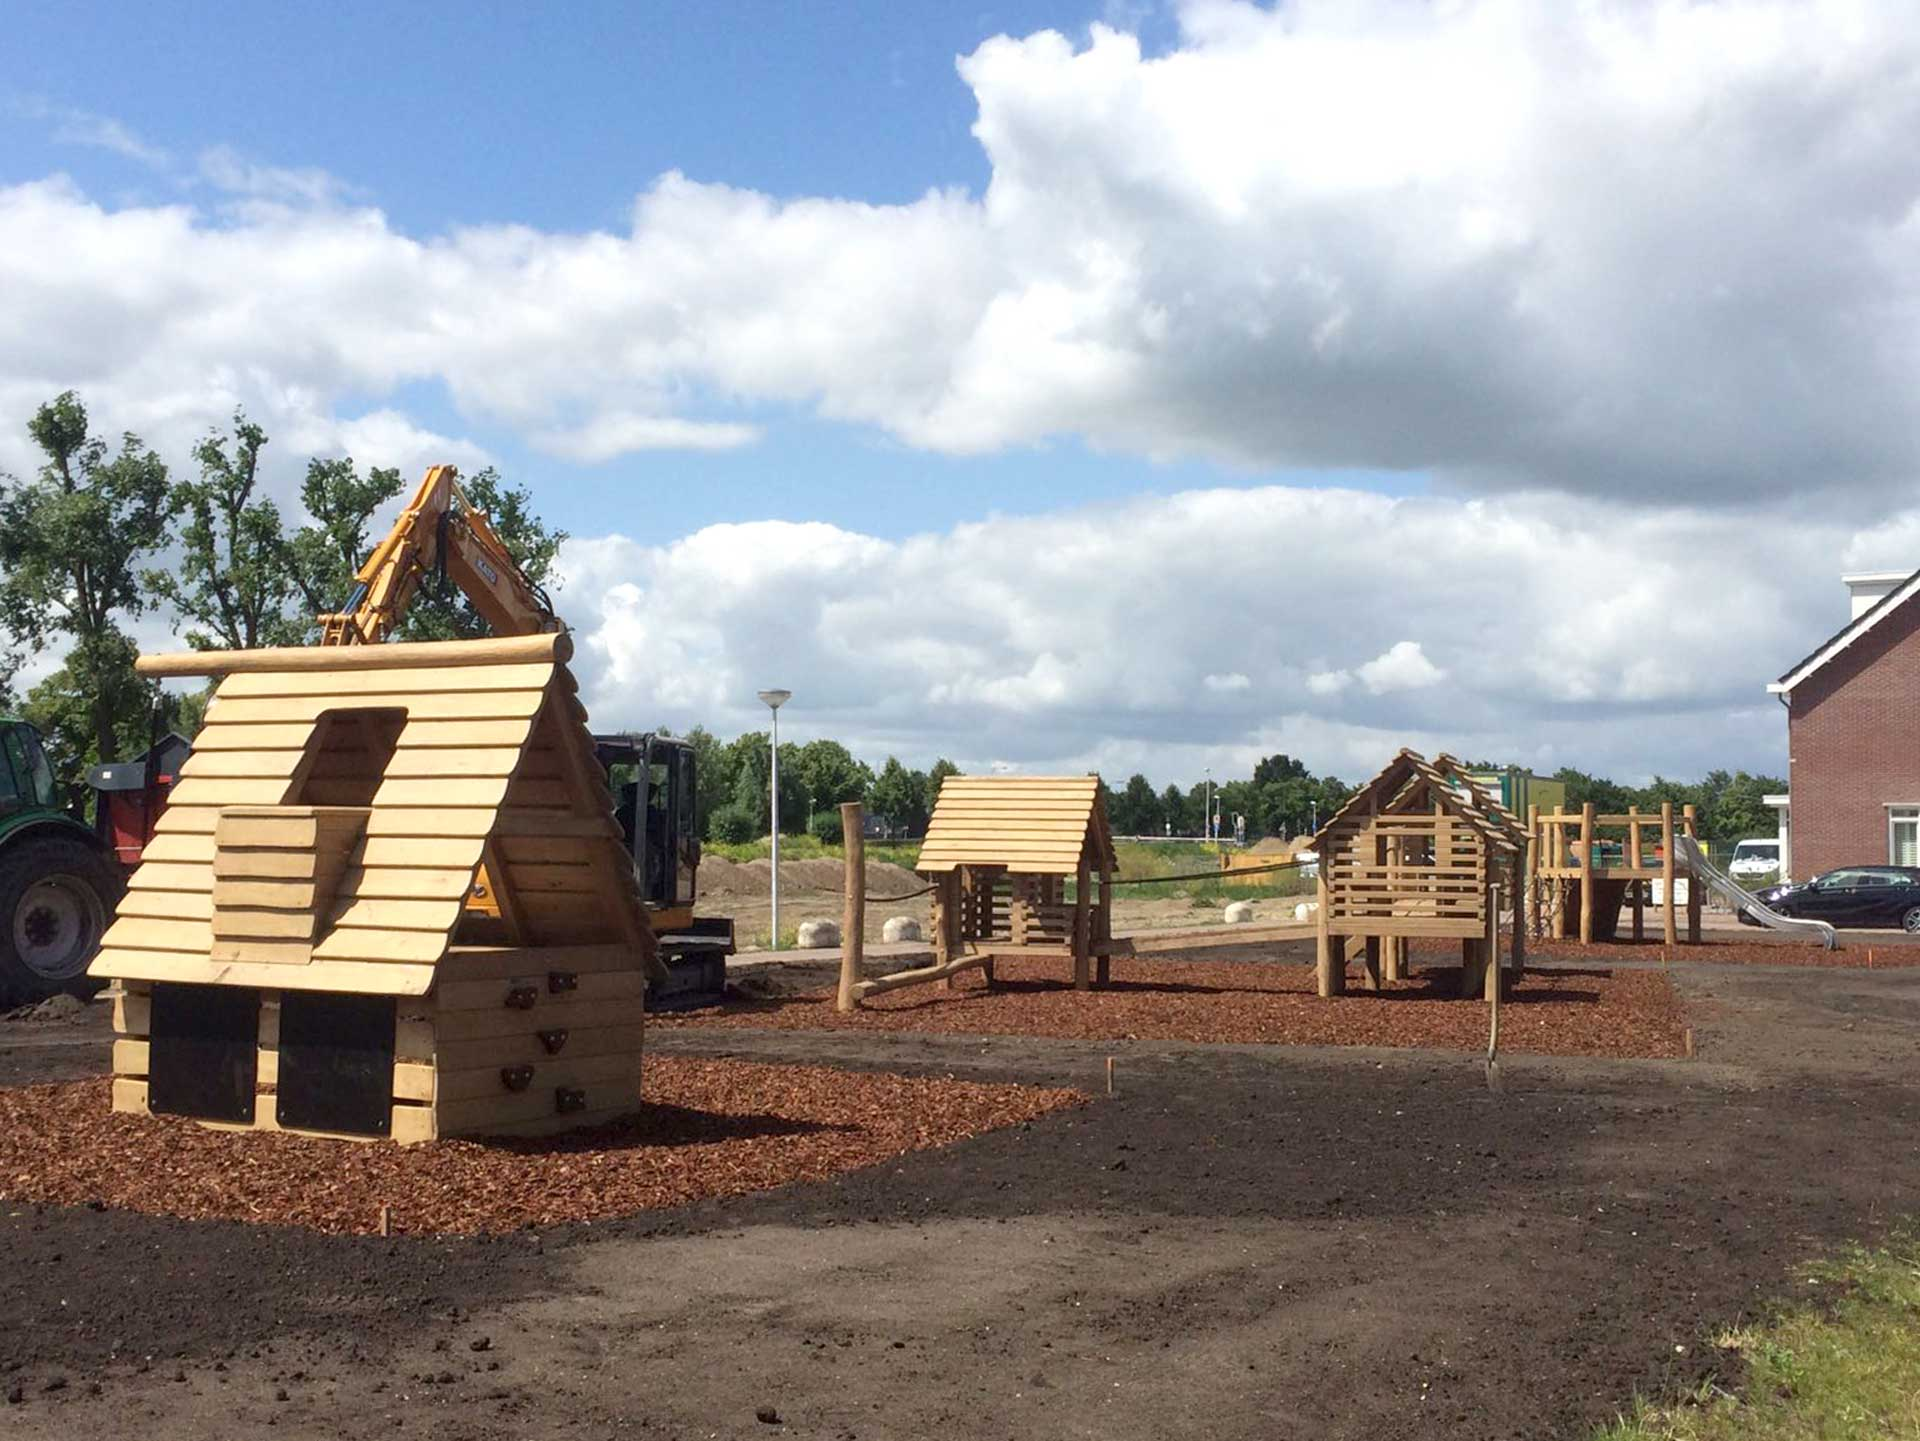 aanleg houten speeltuin